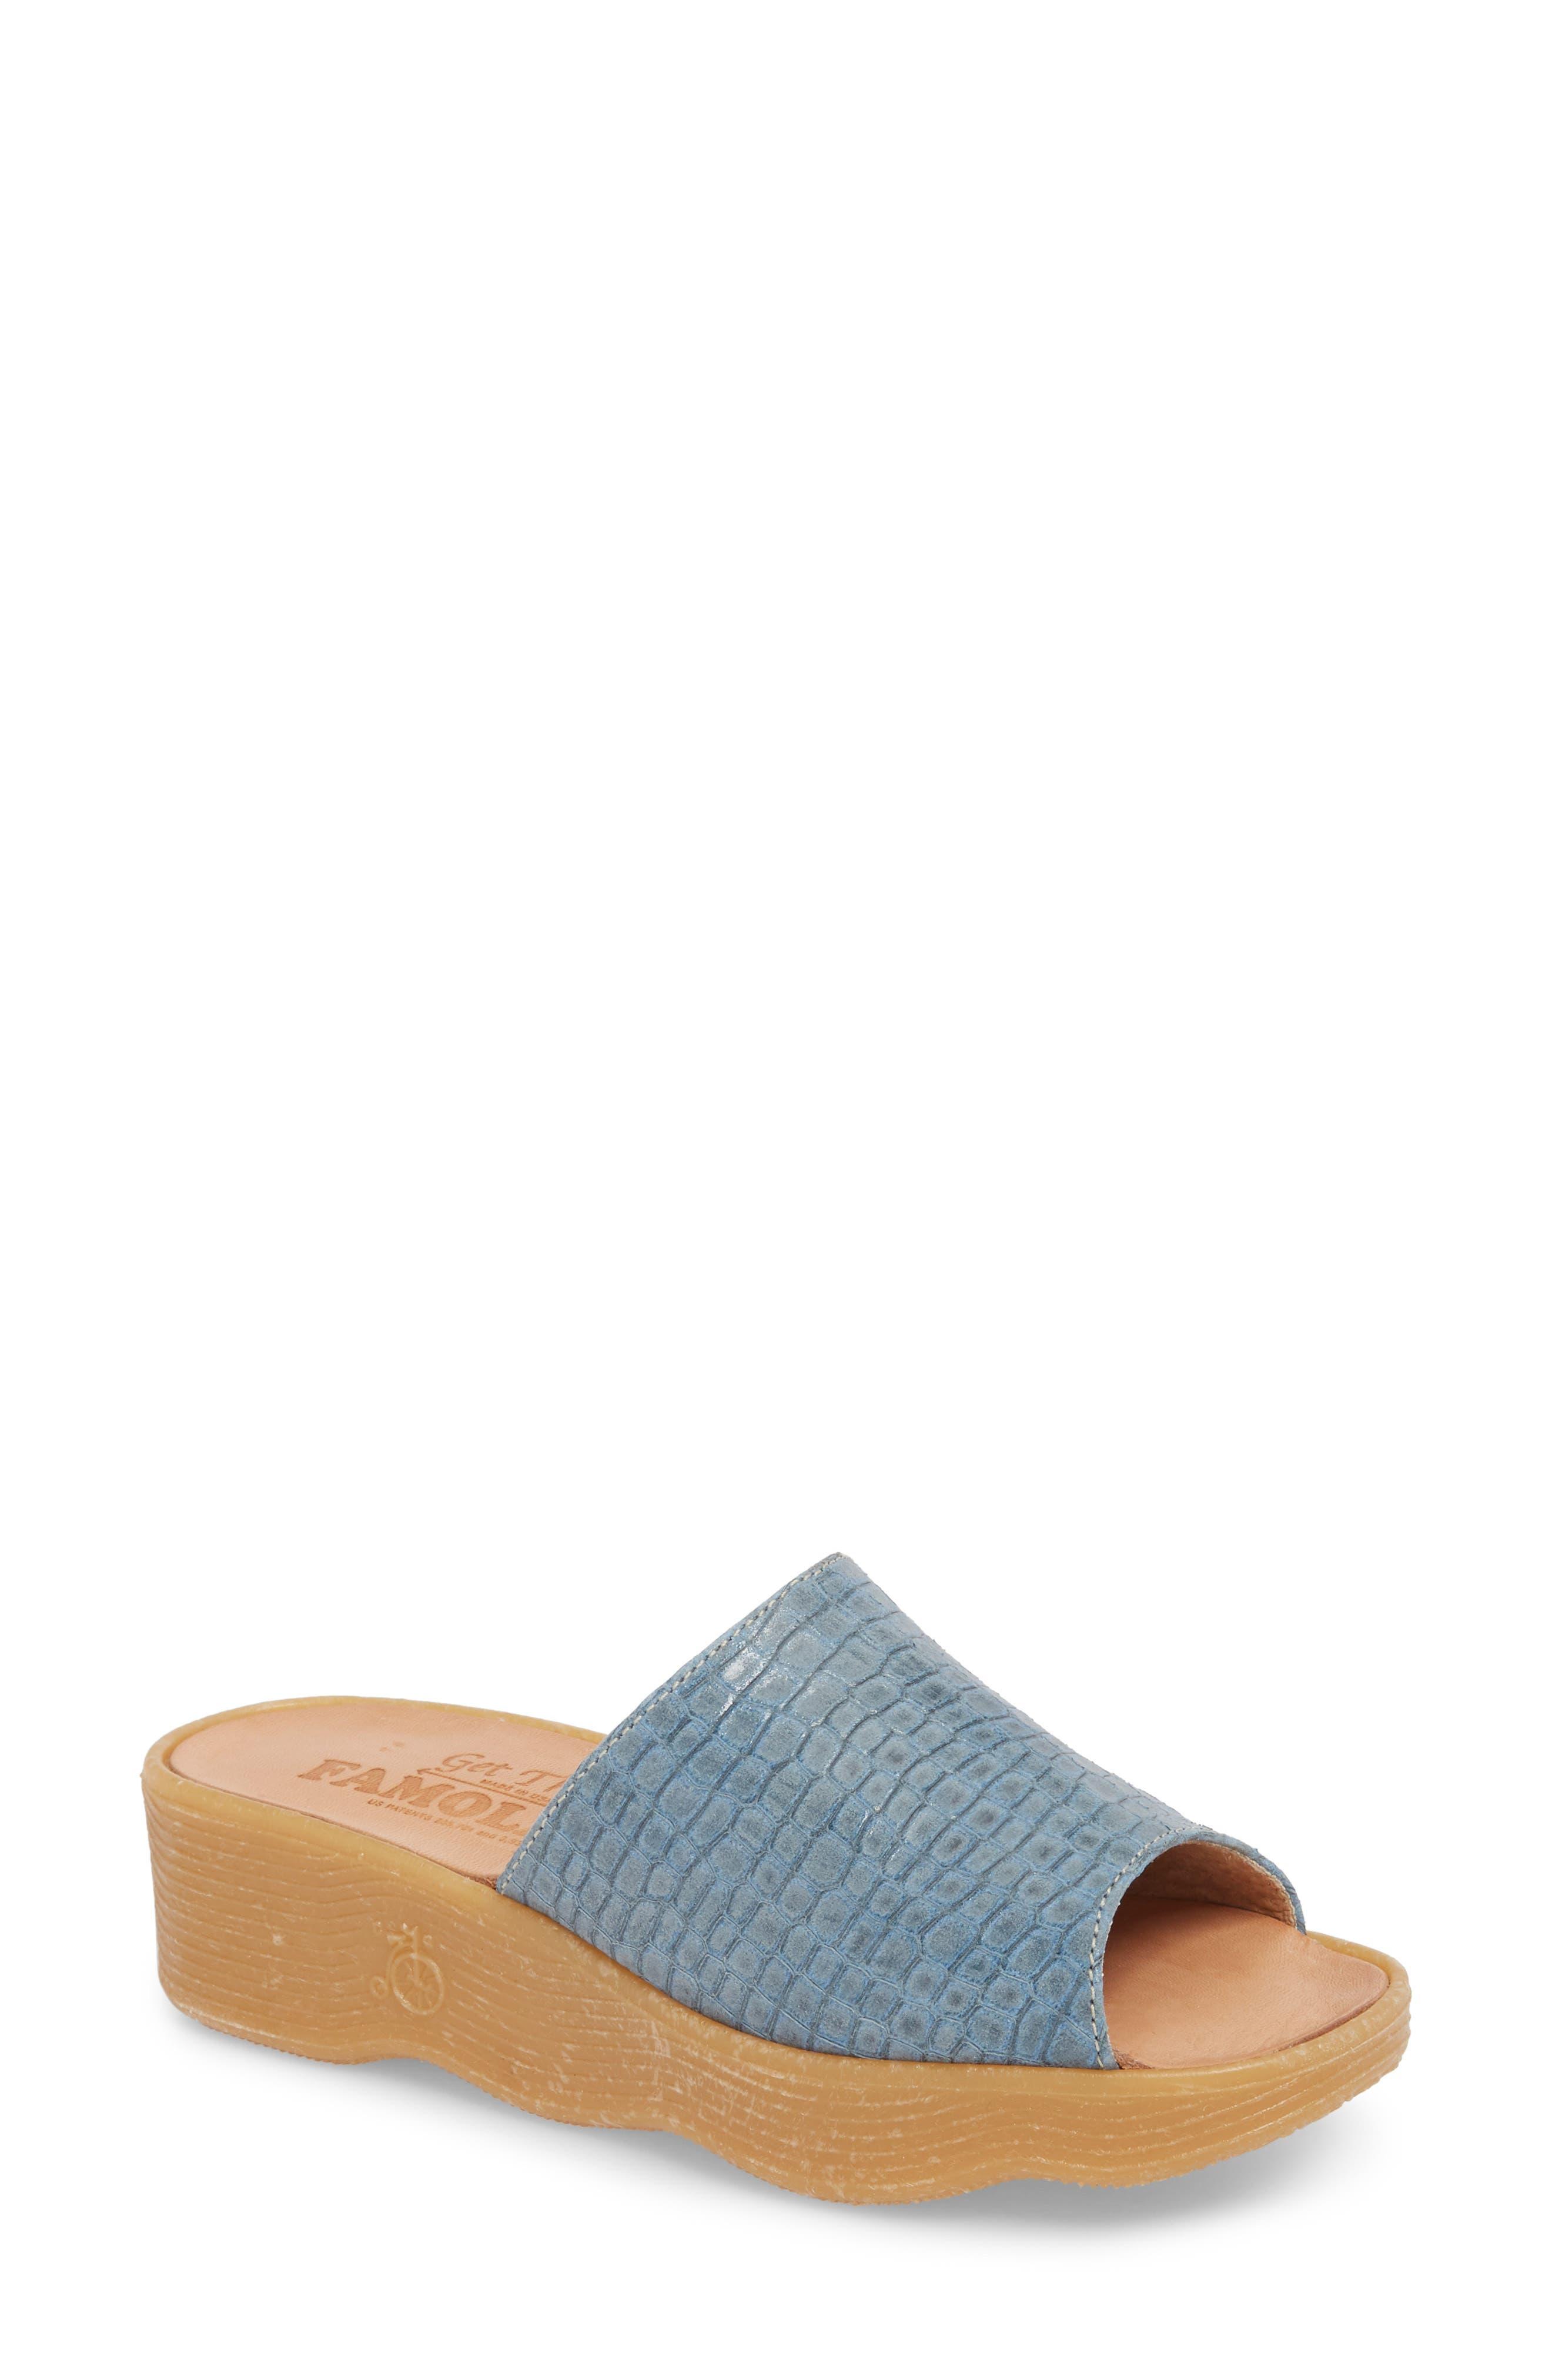 Slide N Sleek Wedge Slide Sandal,                             Main thumbnail 1, color,                             Aqua Croc Printed Leather